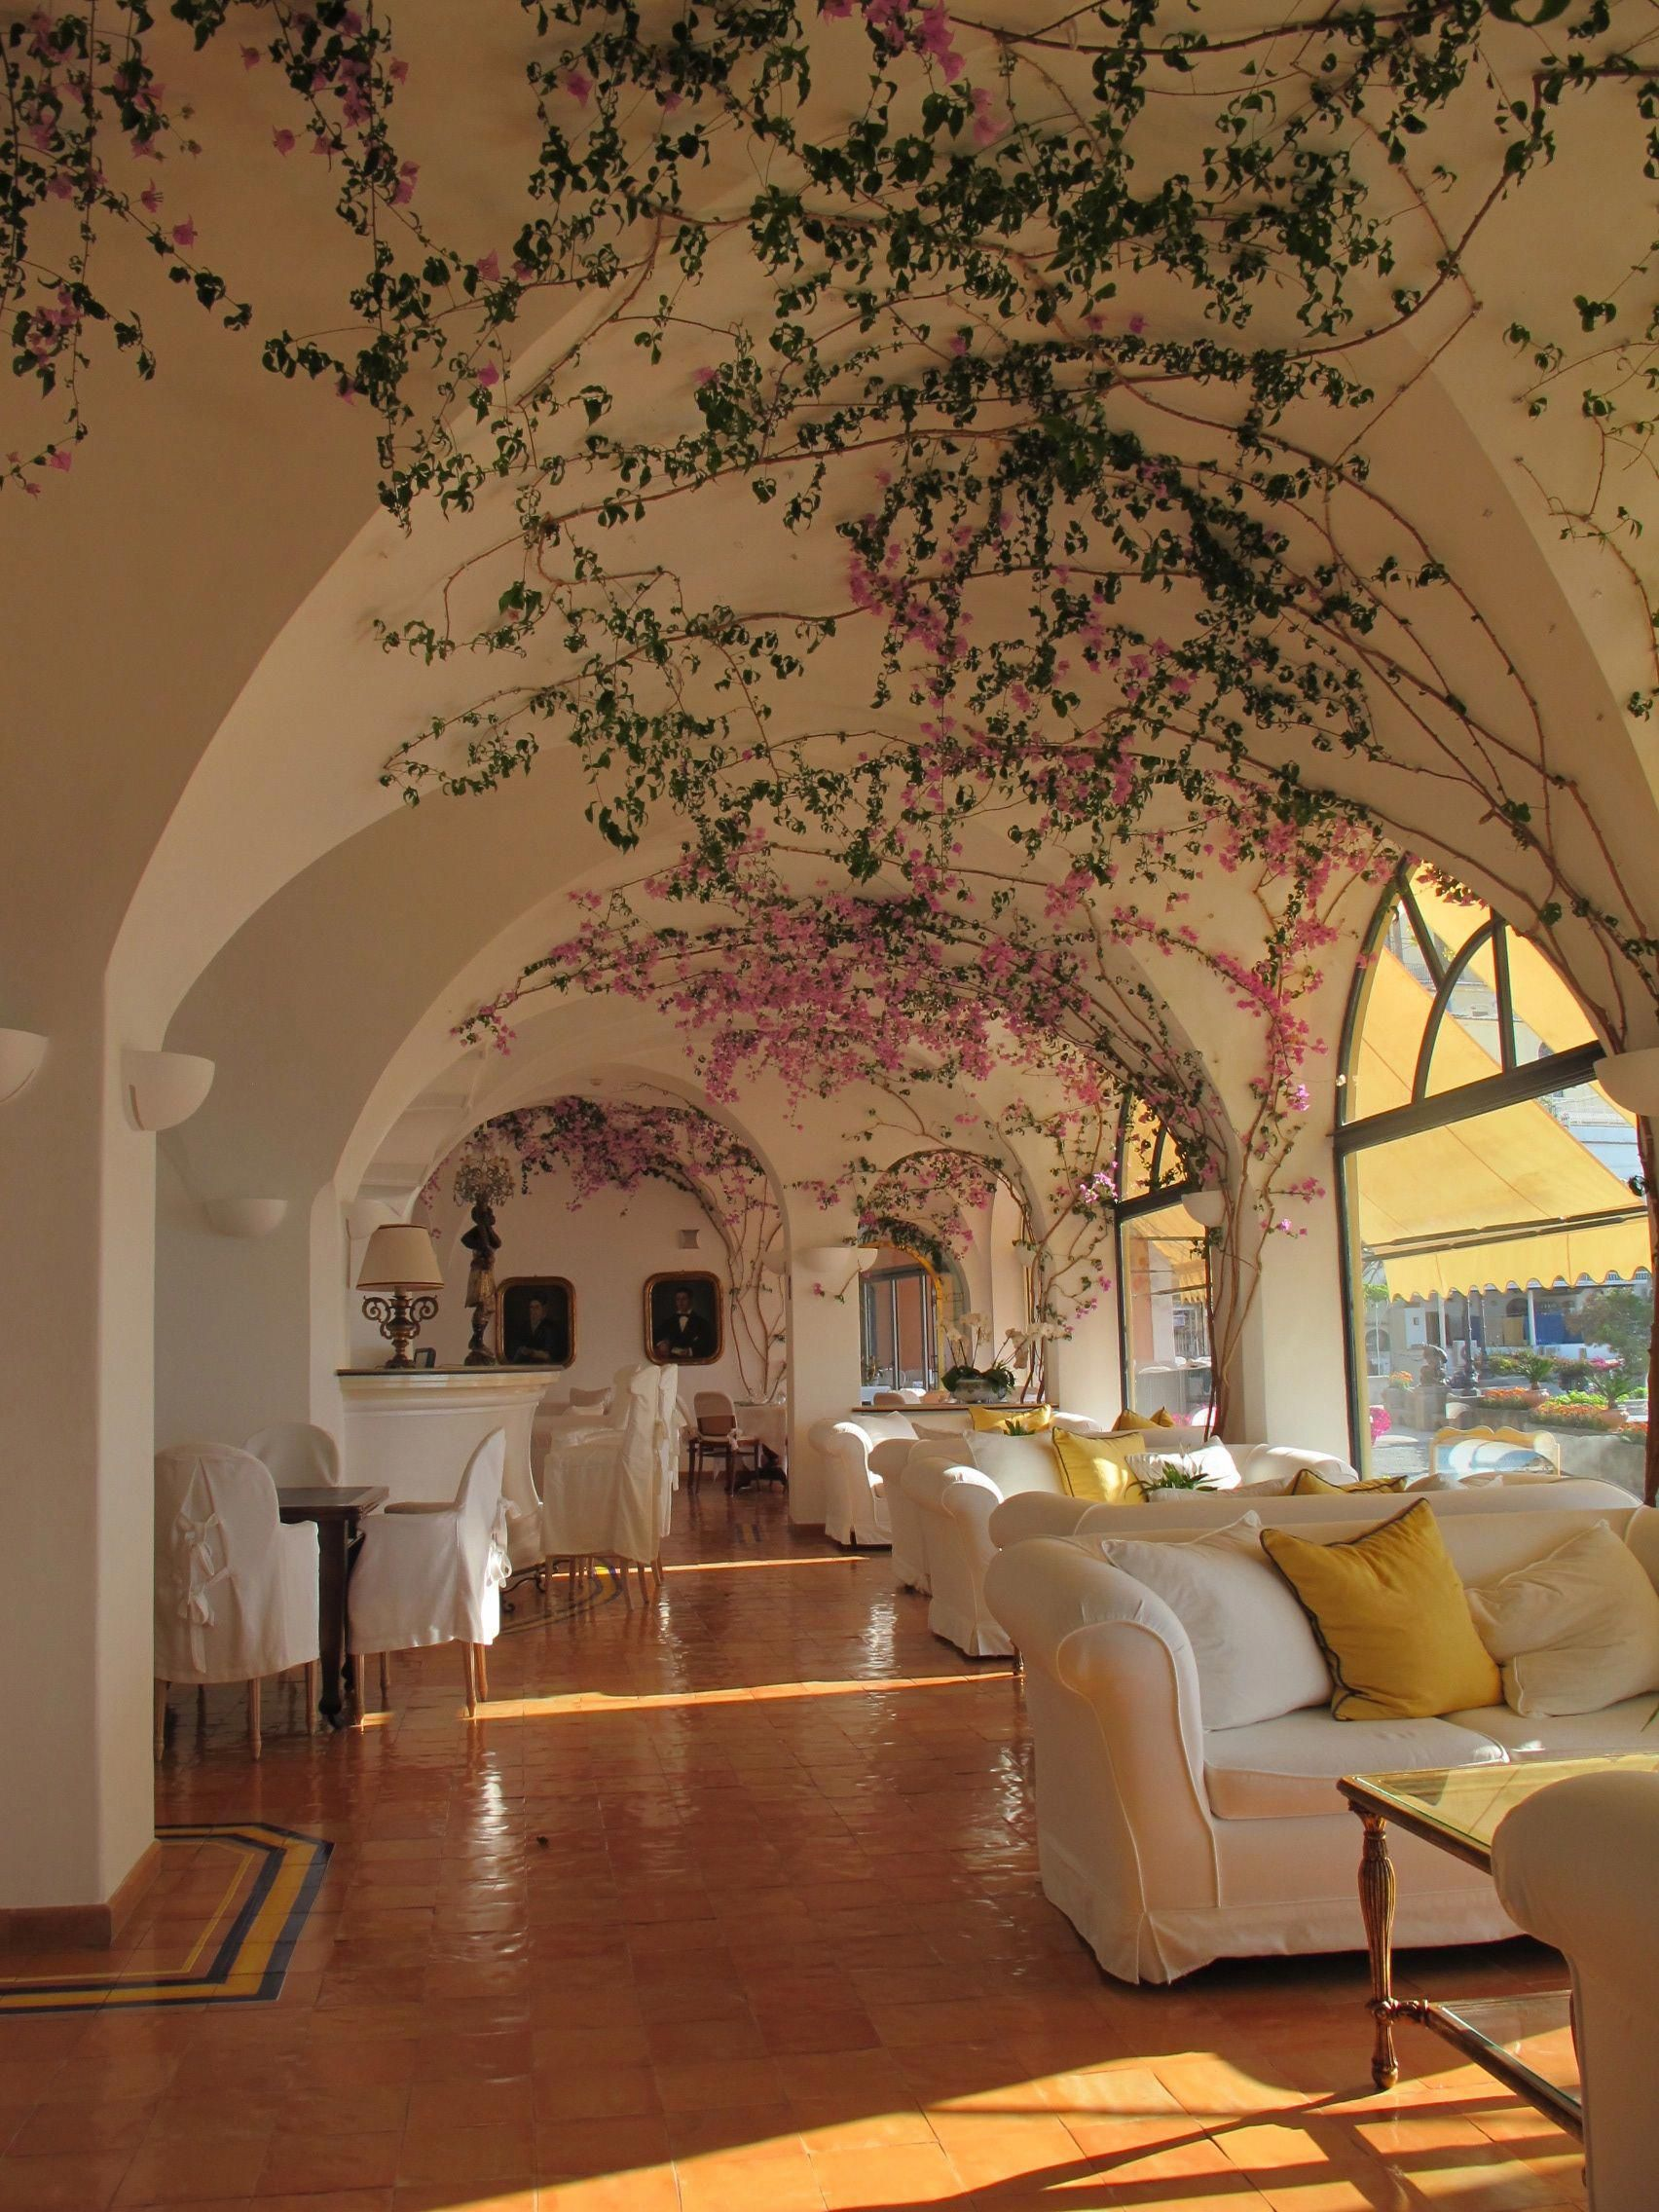 Hotel Villa Tre Ville, Positano, Amalfi Coast